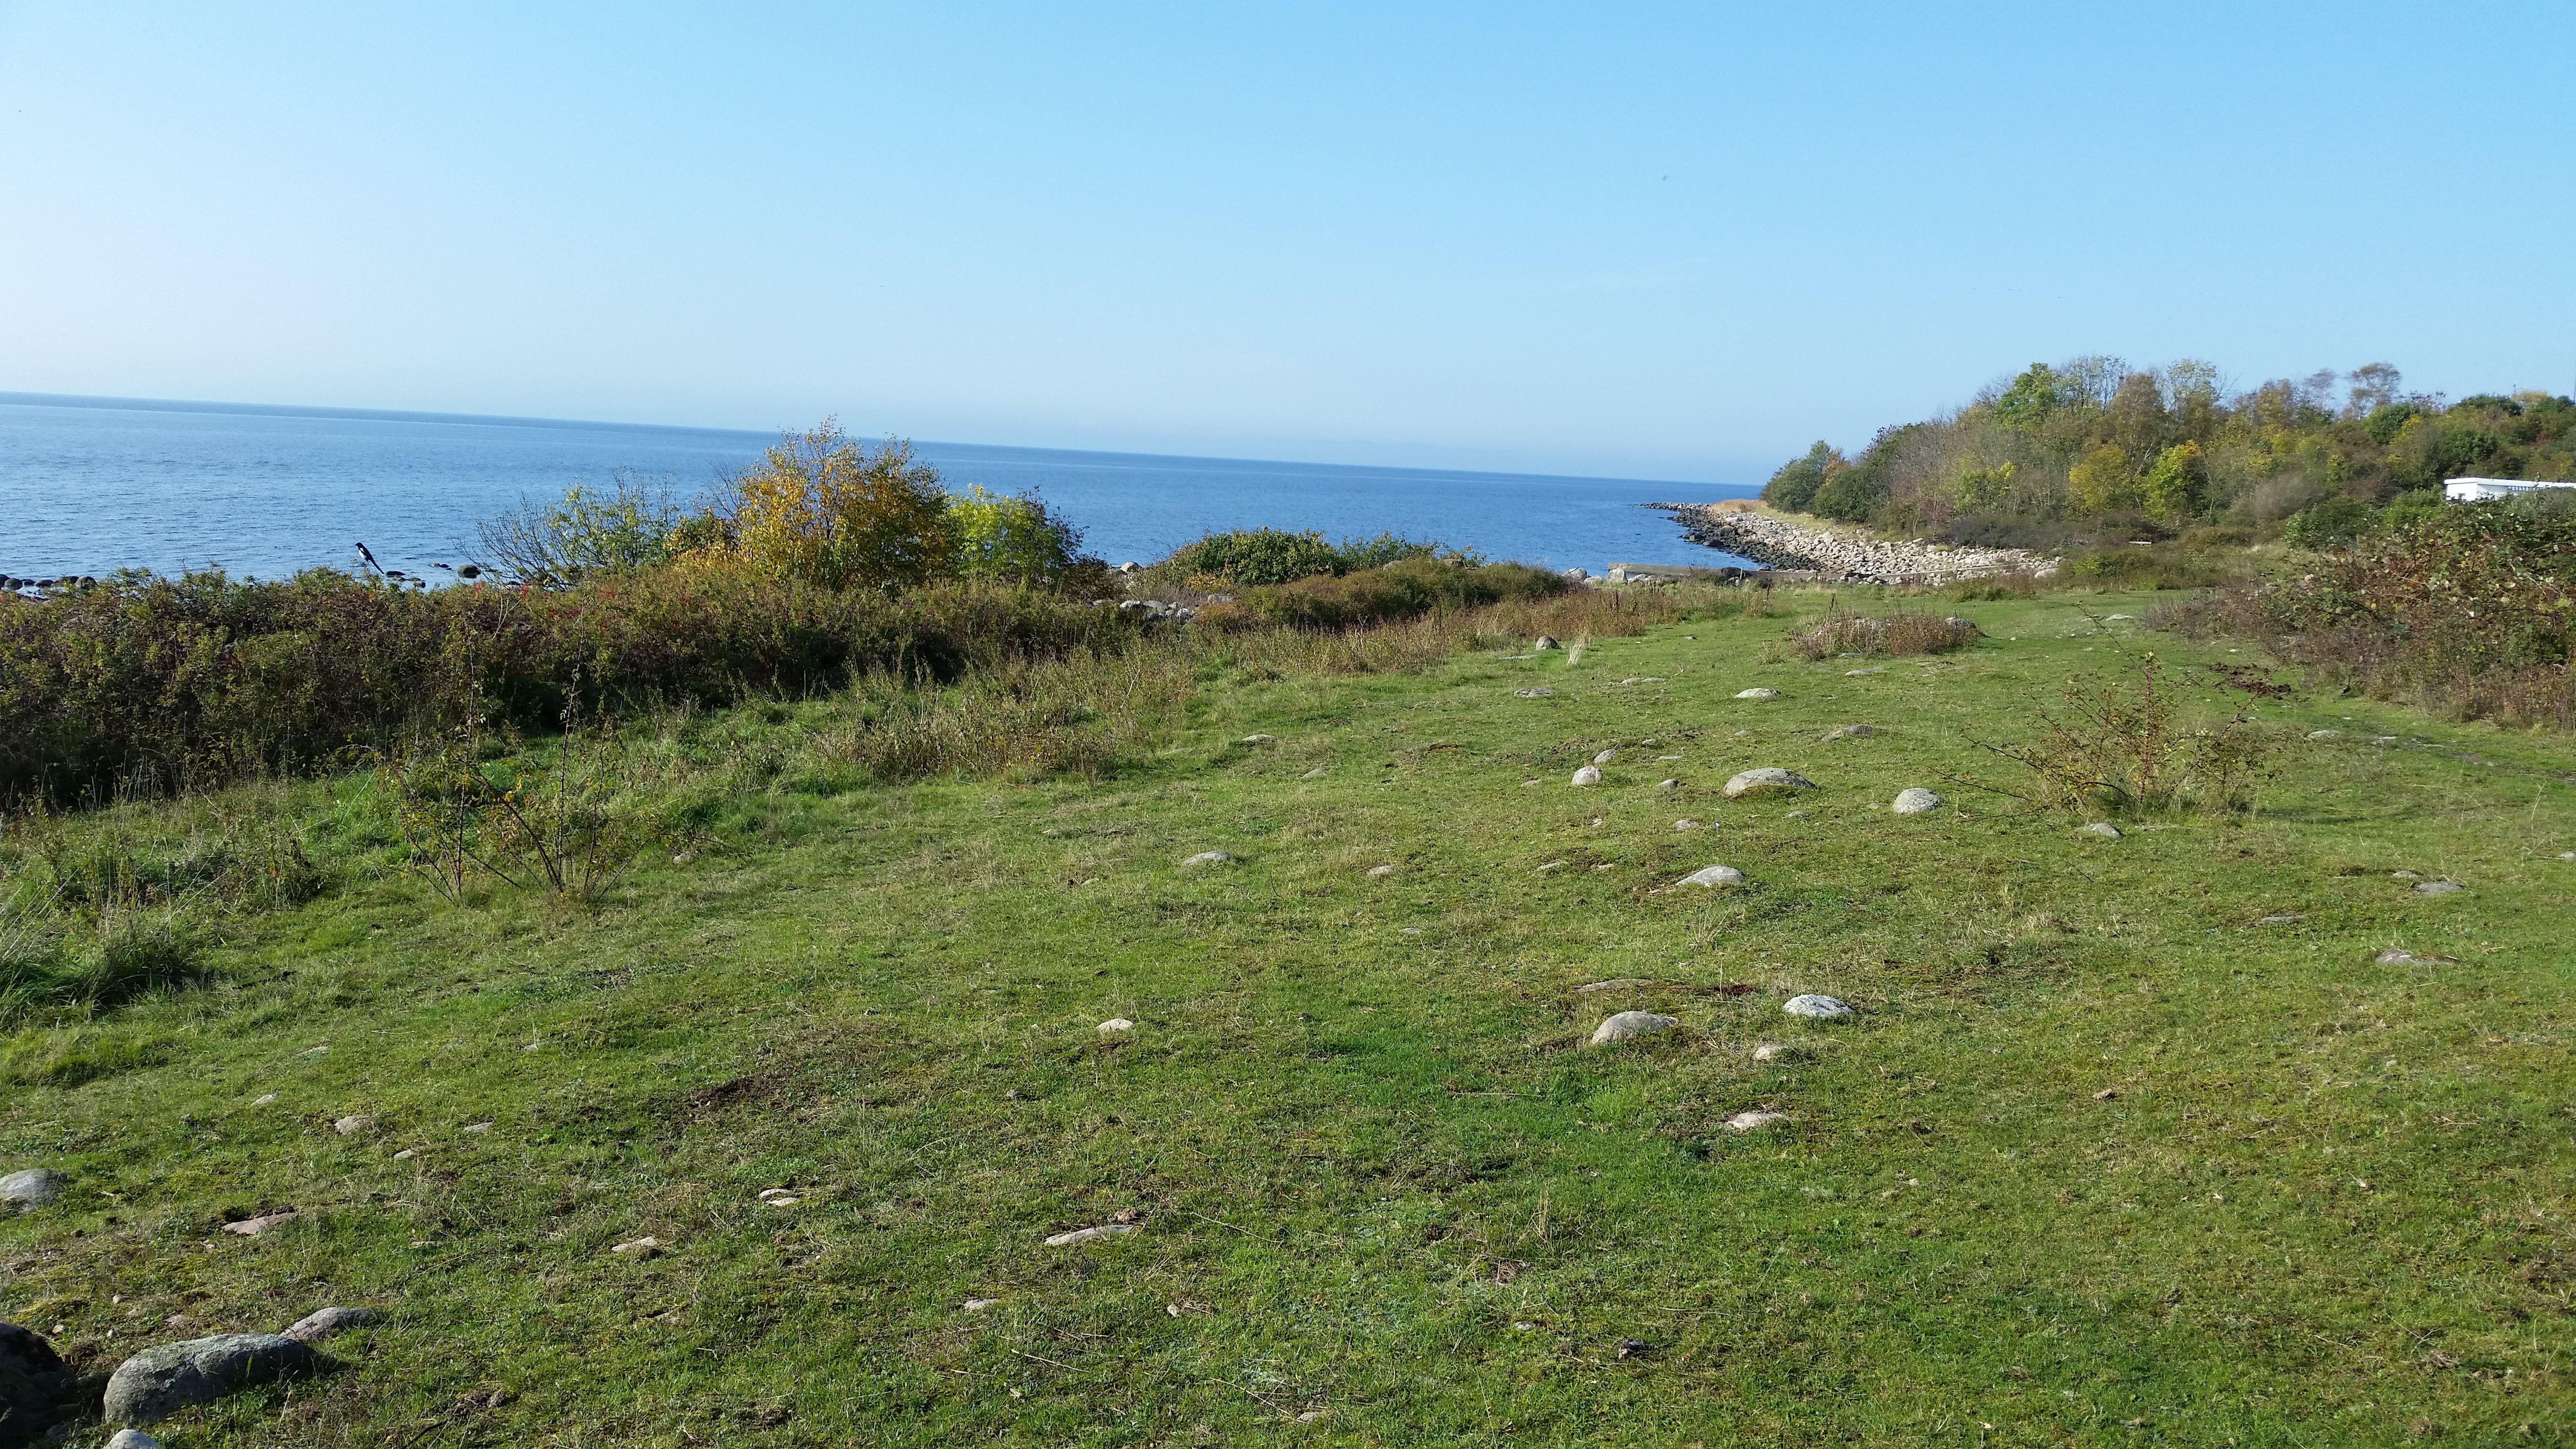 Magnarps strandmarker